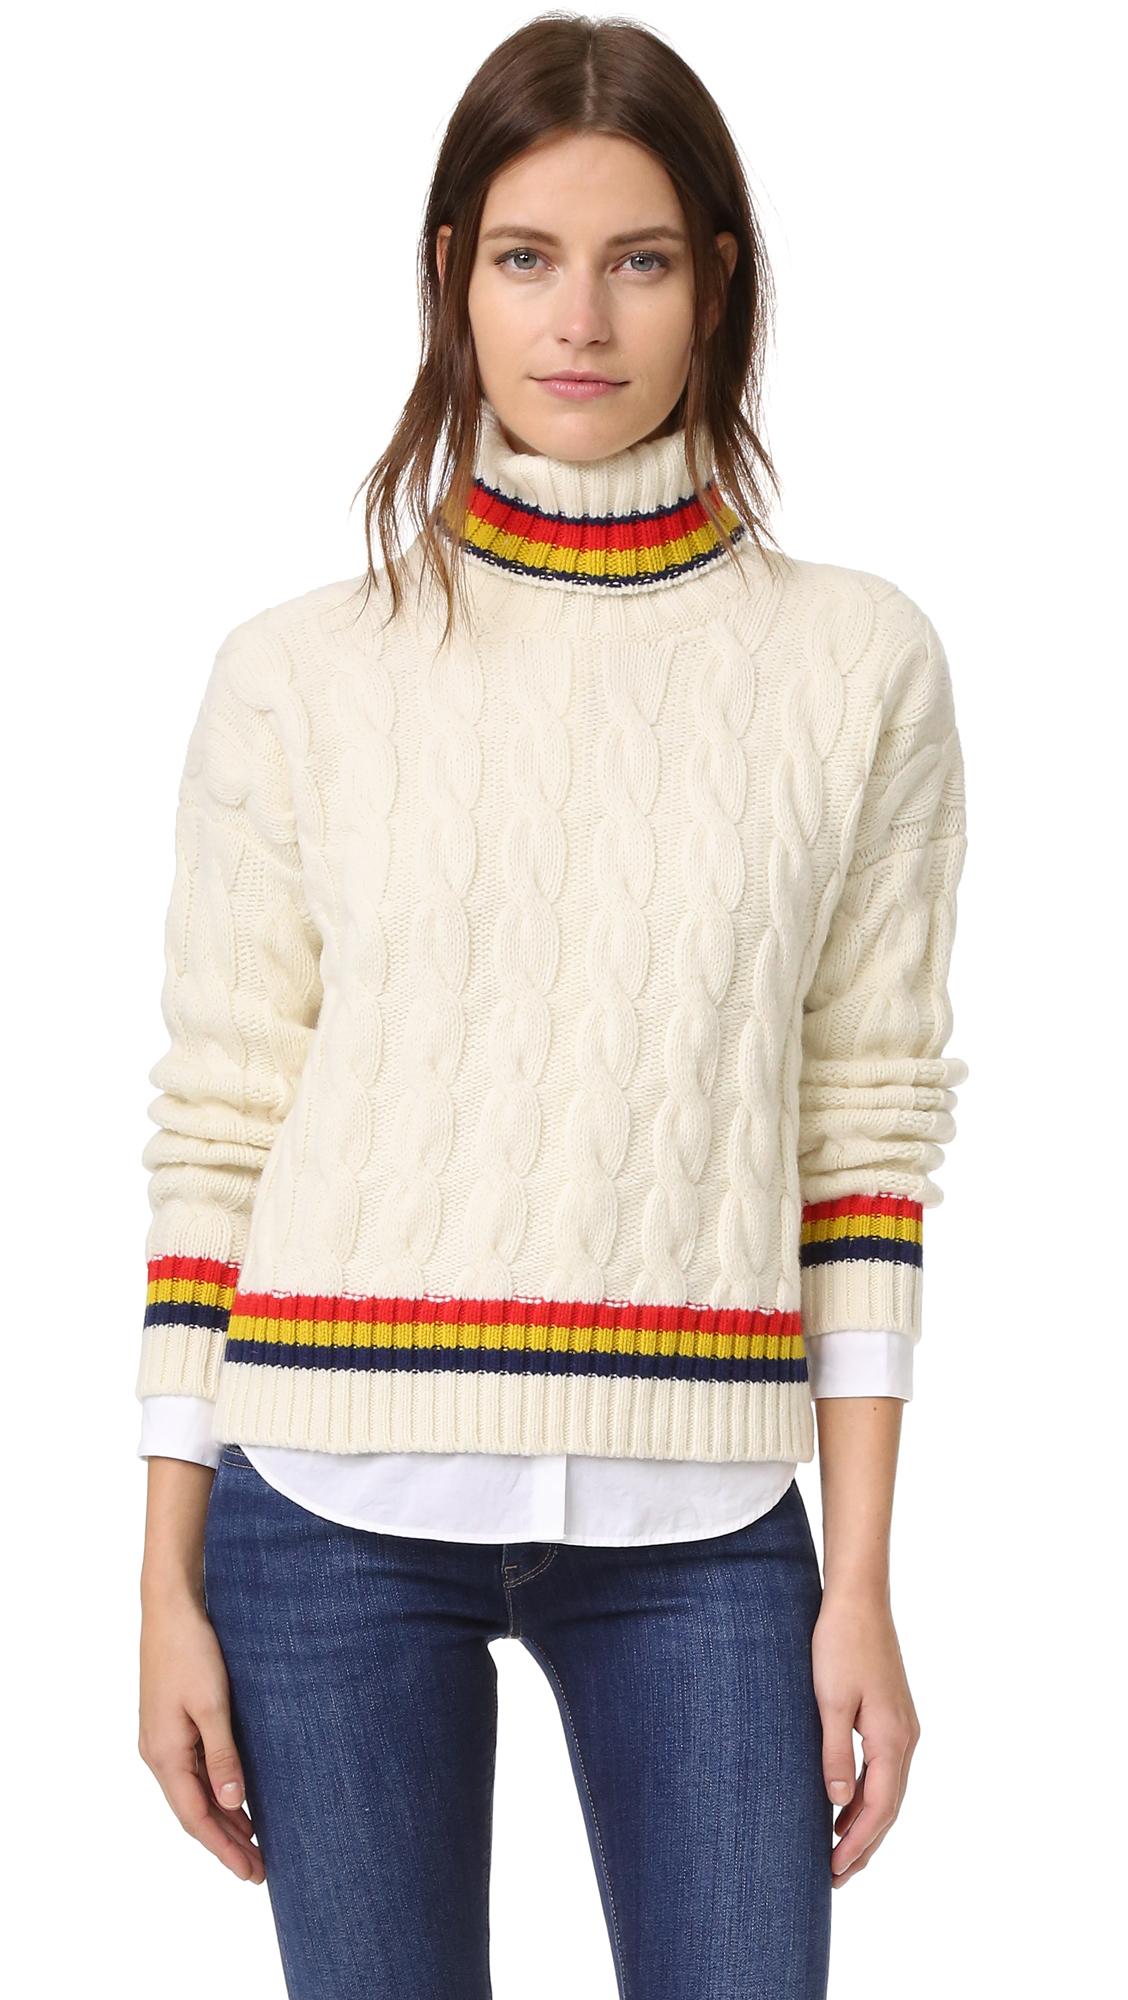 &Daughter Cricket Roll Neck Sweater - Ecru at Shopbop